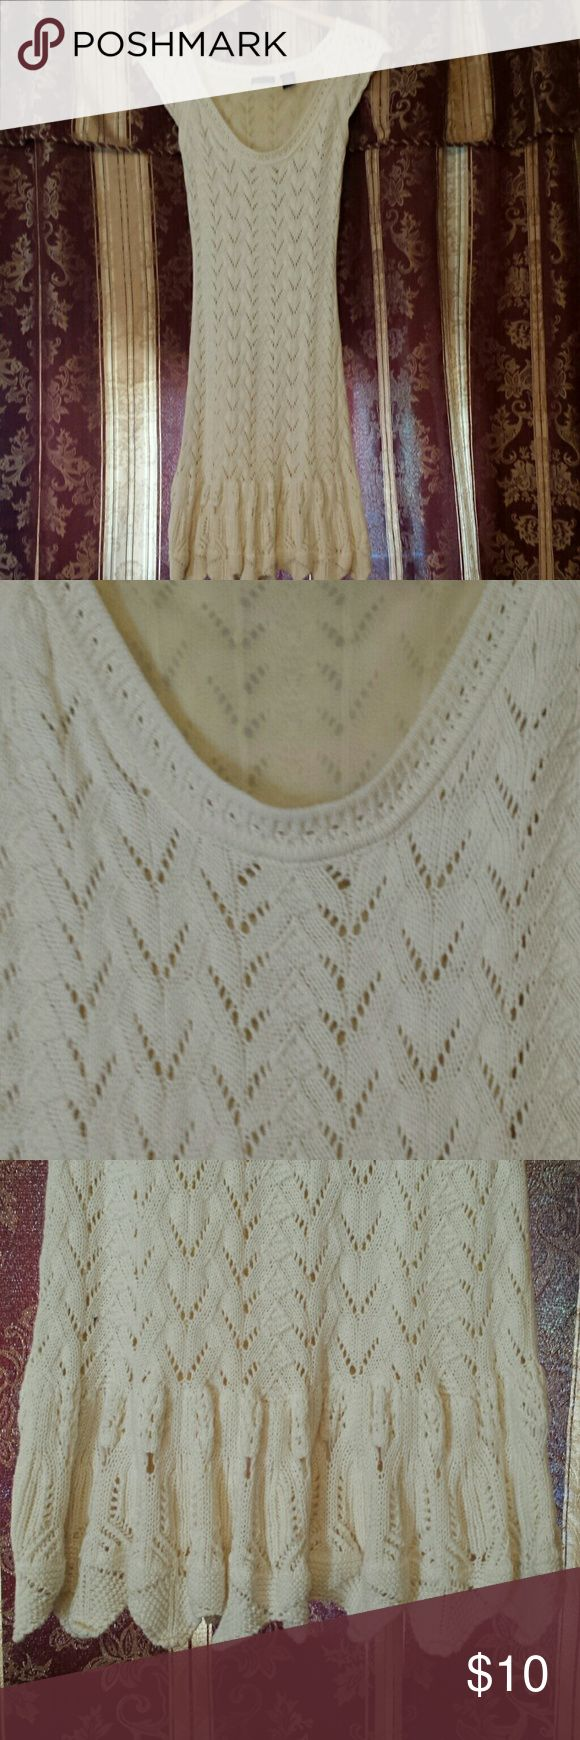 VS Sweater dress Cream cap sleeve knee length dress. Fully lined. Worn once.  Great condition. Moda International Dresses Midi